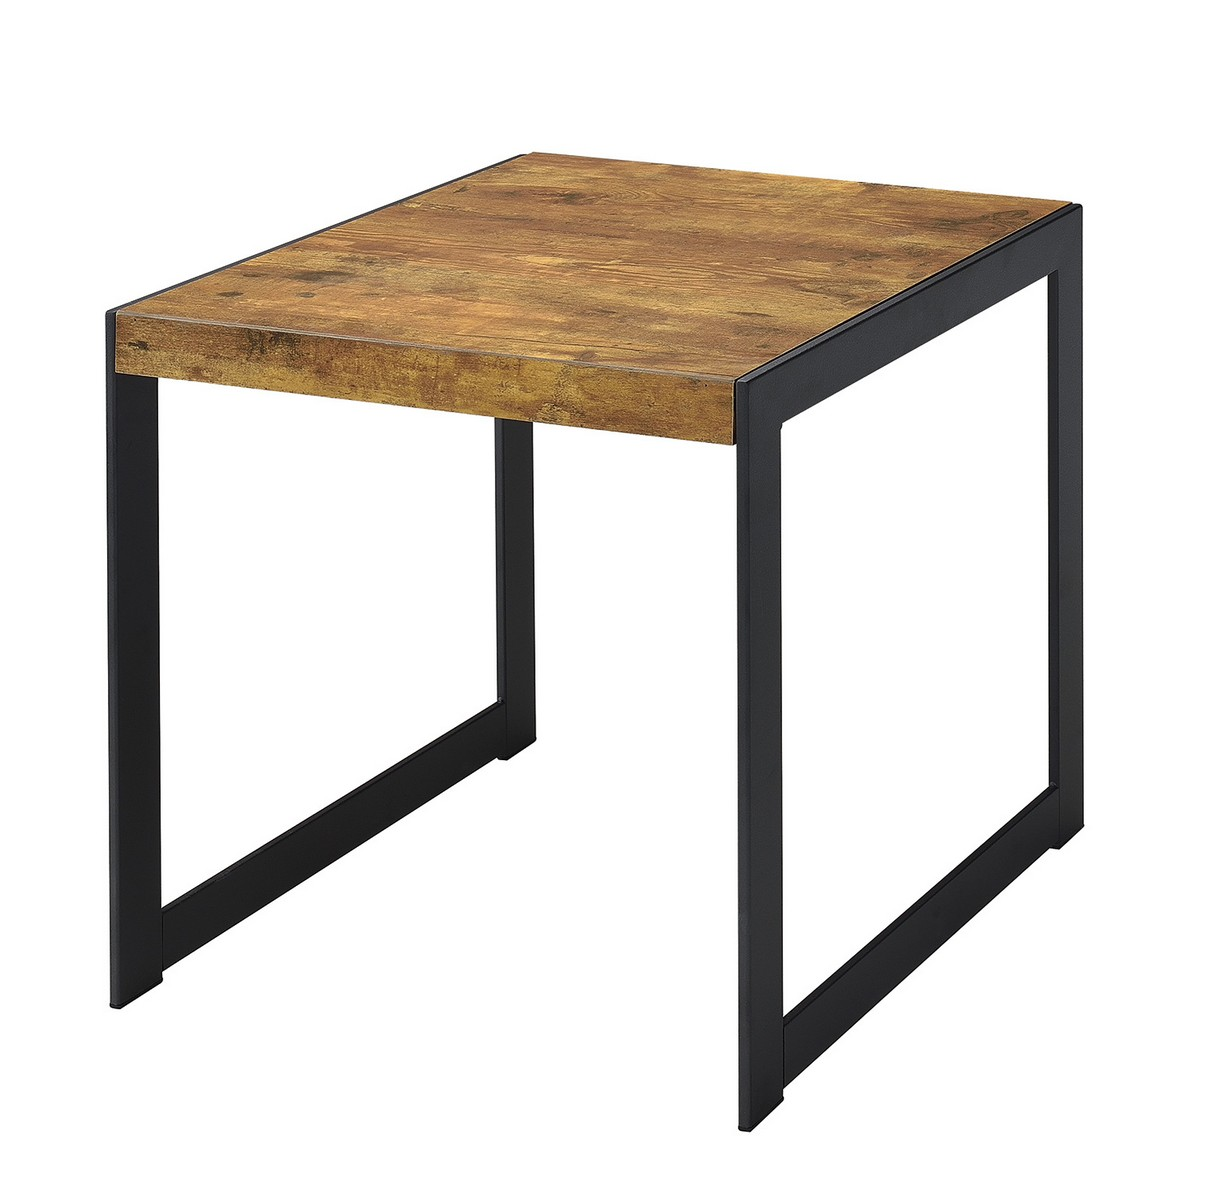 Coaster 704027 End Table - Antique Nutmeg/gunmetal